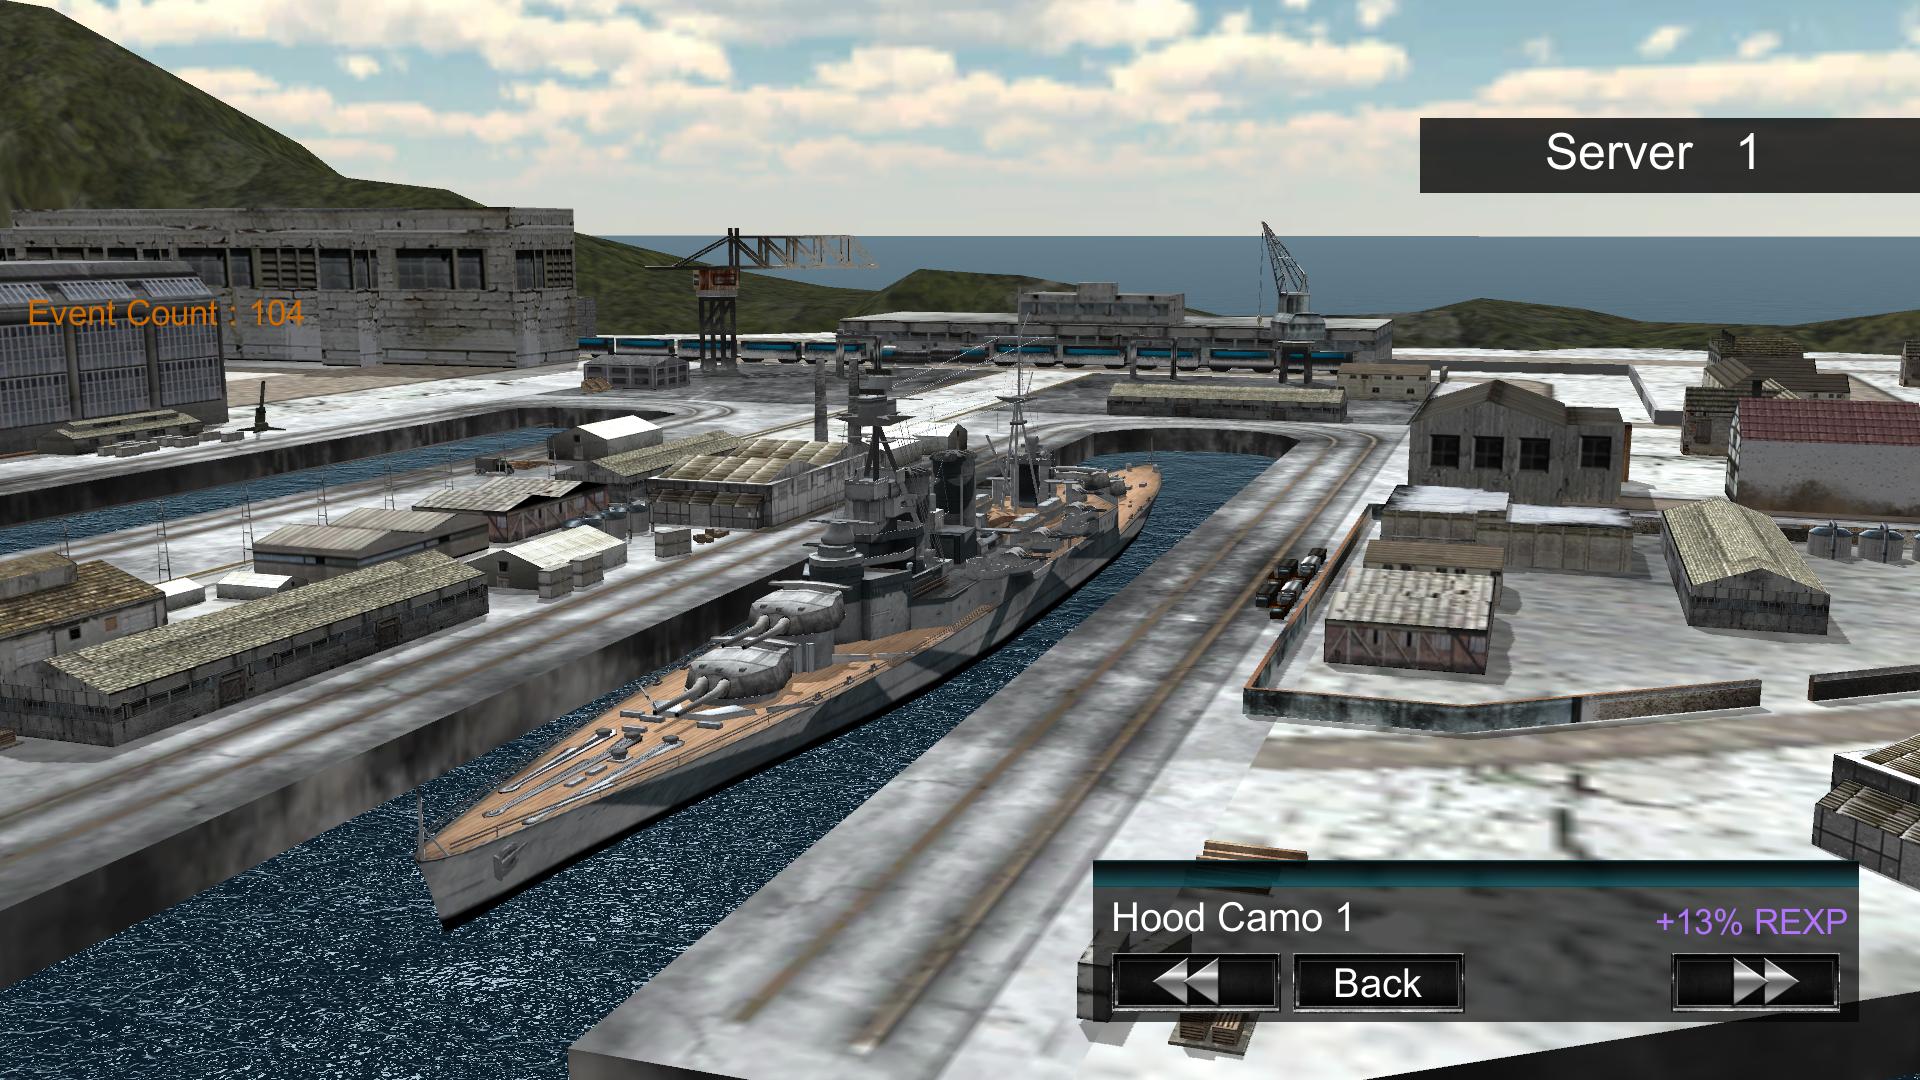 Image - Hood camo 1.png | Naval Front-Line Wiki | Fandom powered ...